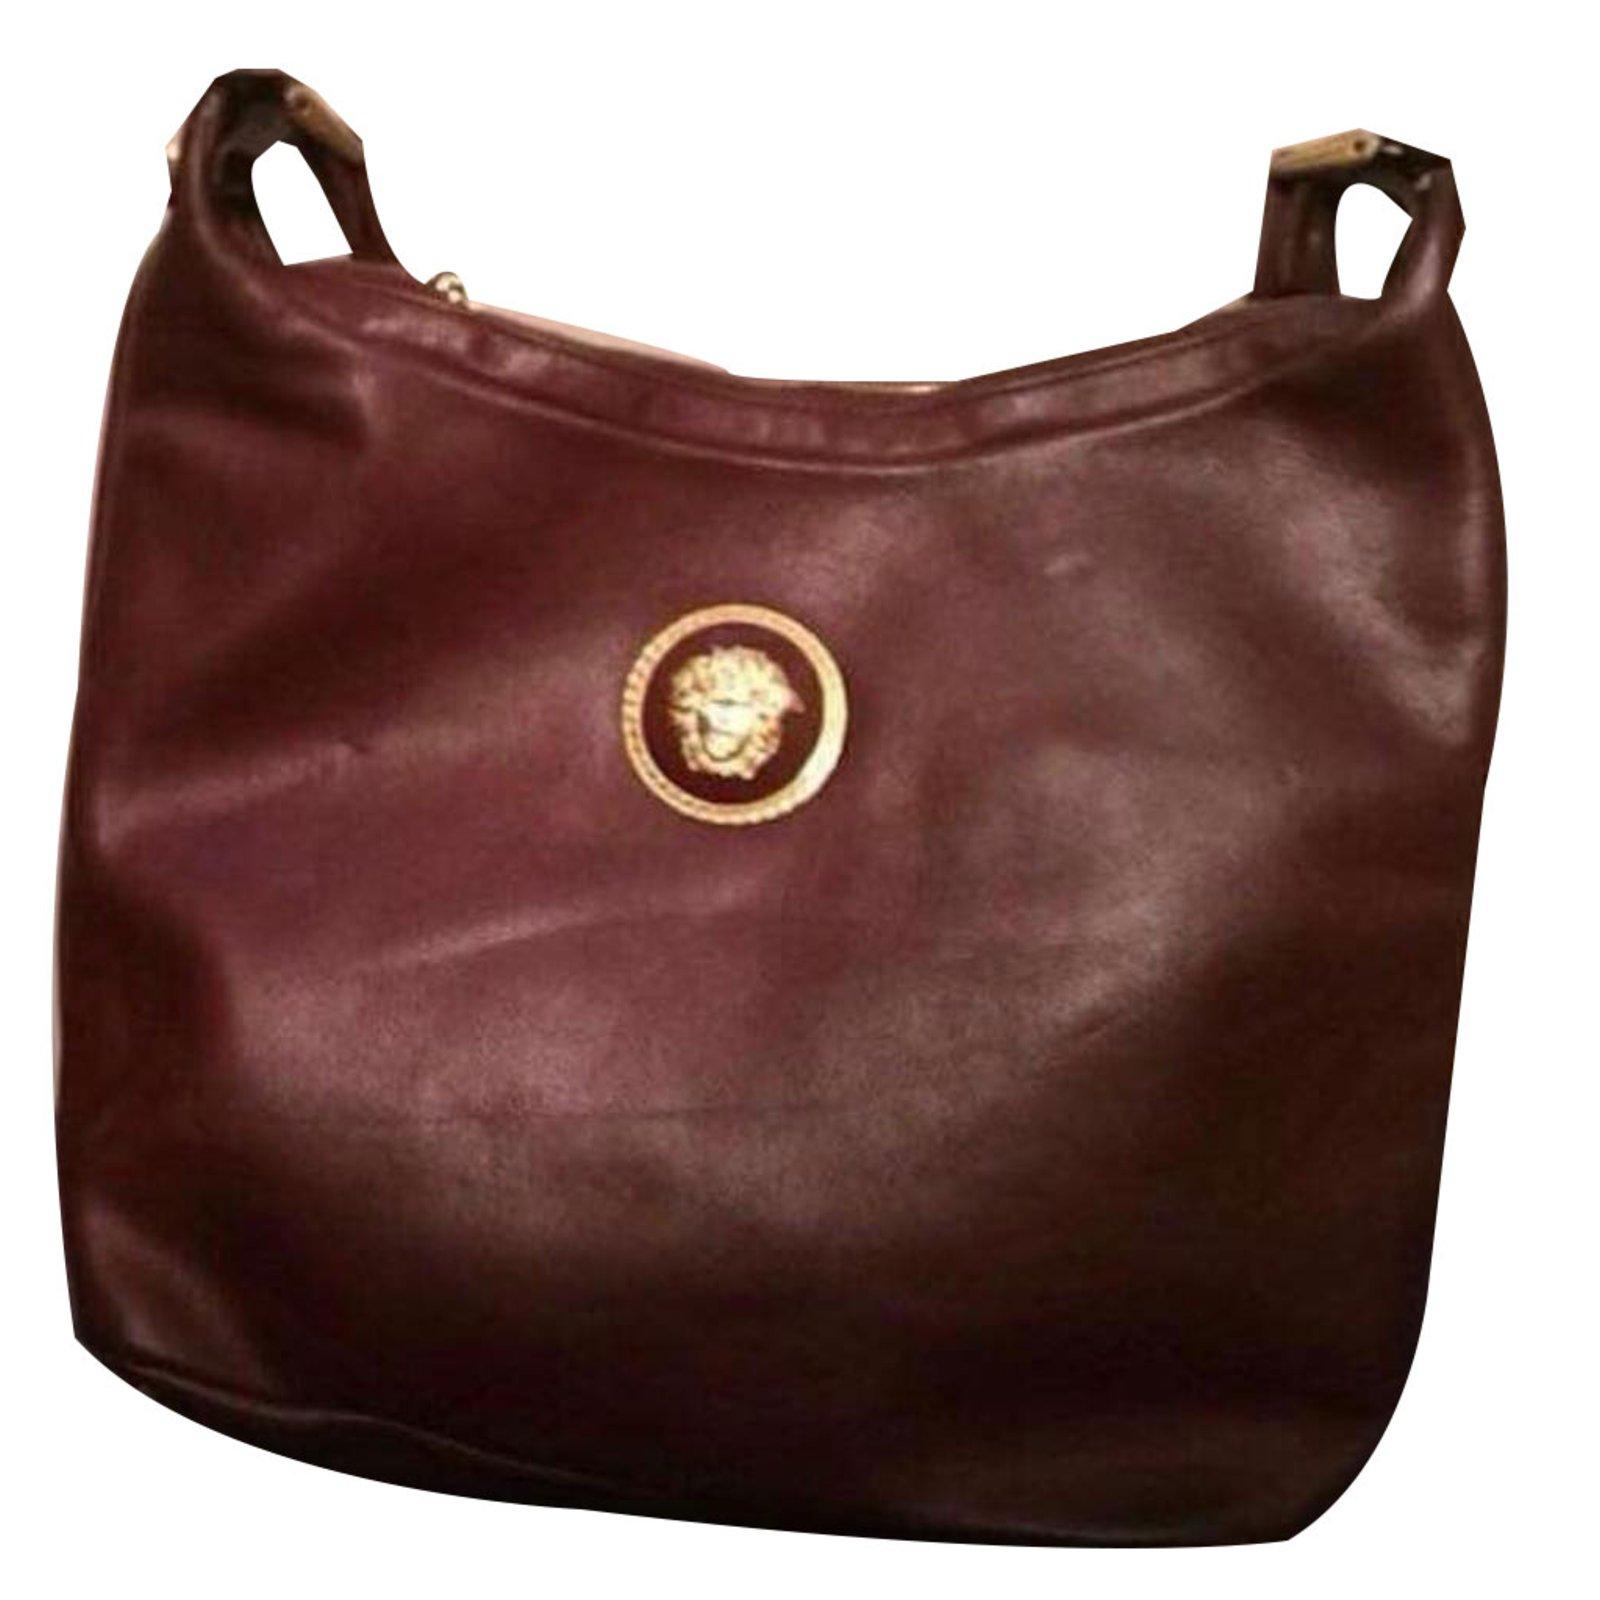 a18cdfed08 Gianni Versace Handbags Handbags Leather Brown ref.66125 - Joli Closet